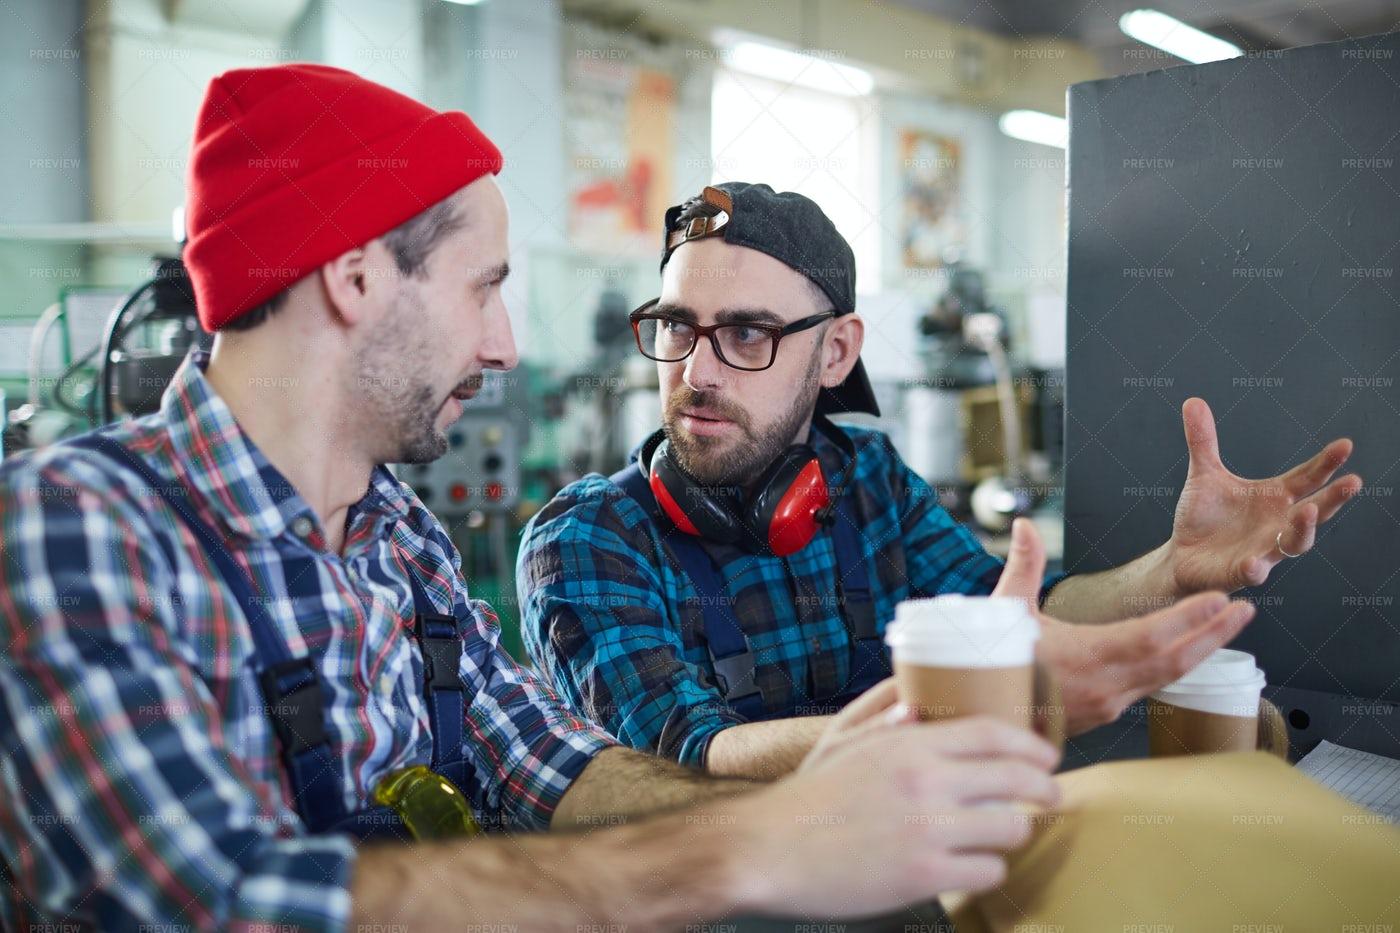 Workers On Coffee Break: Stock Photos